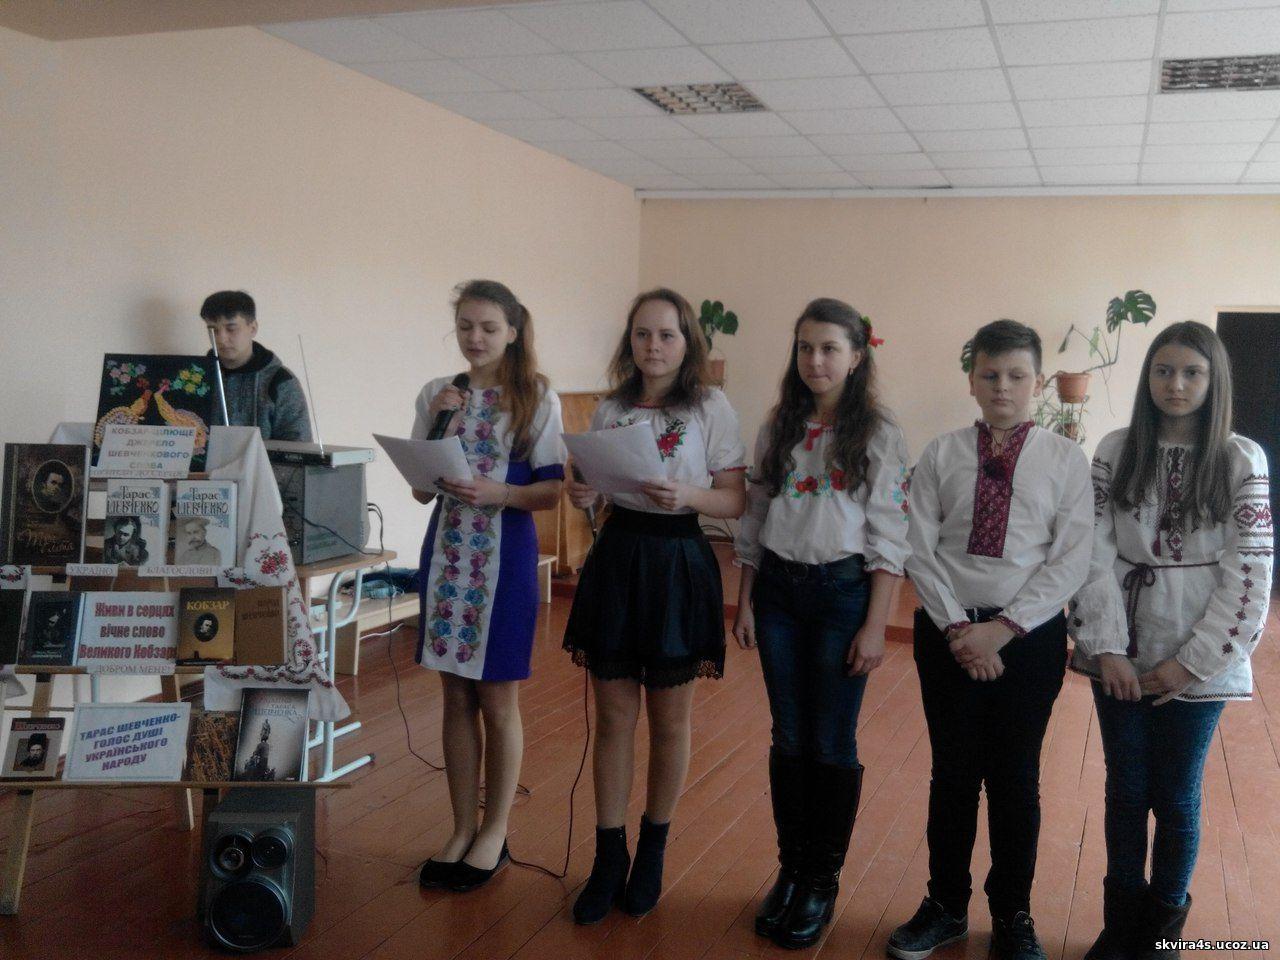 http://skvira4s.ucoz.ua/foto/09-03-17/8bTF0pnqVEU.jpg